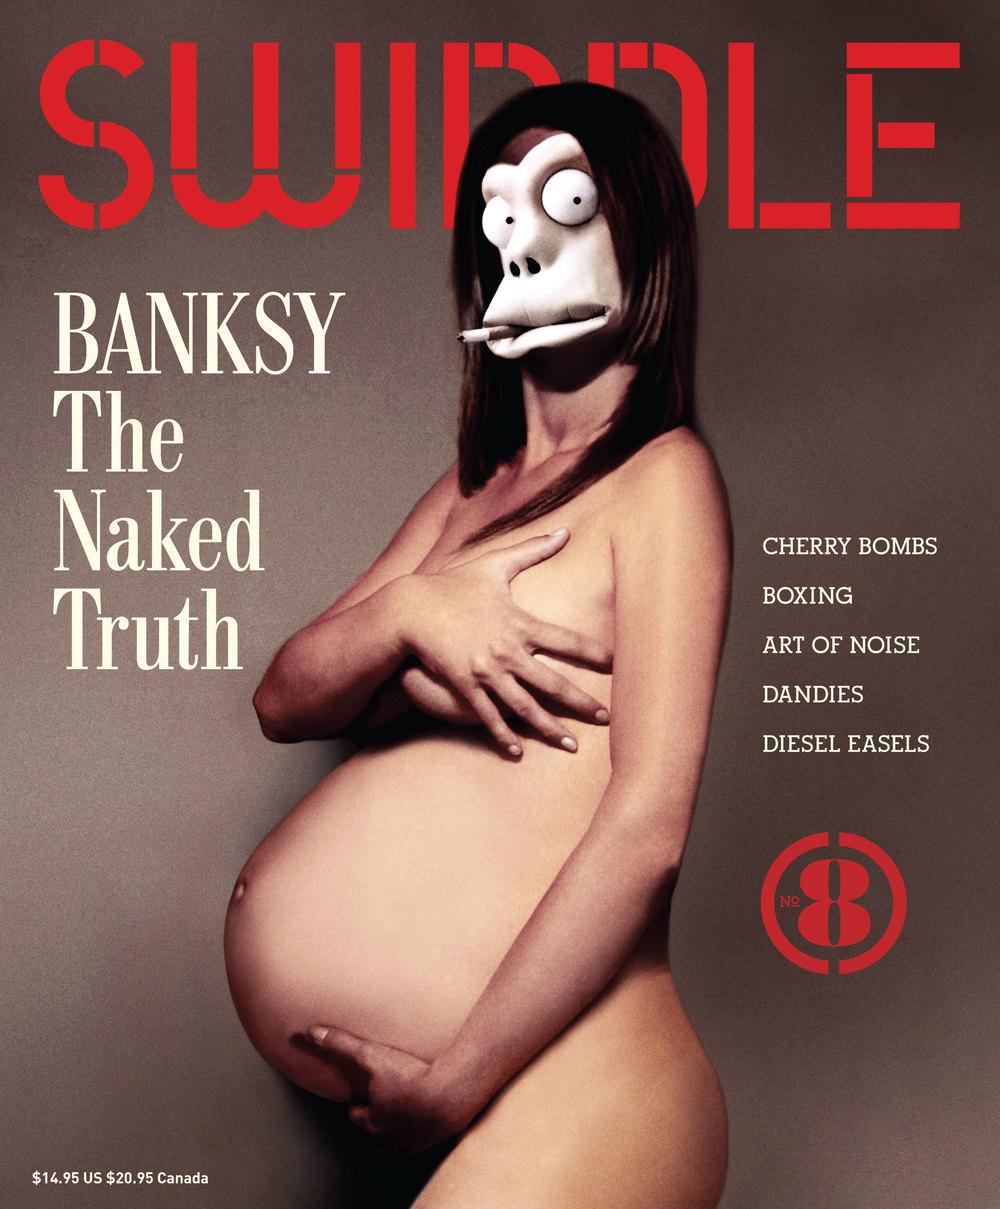 Banksyhard_front_cover.jpg